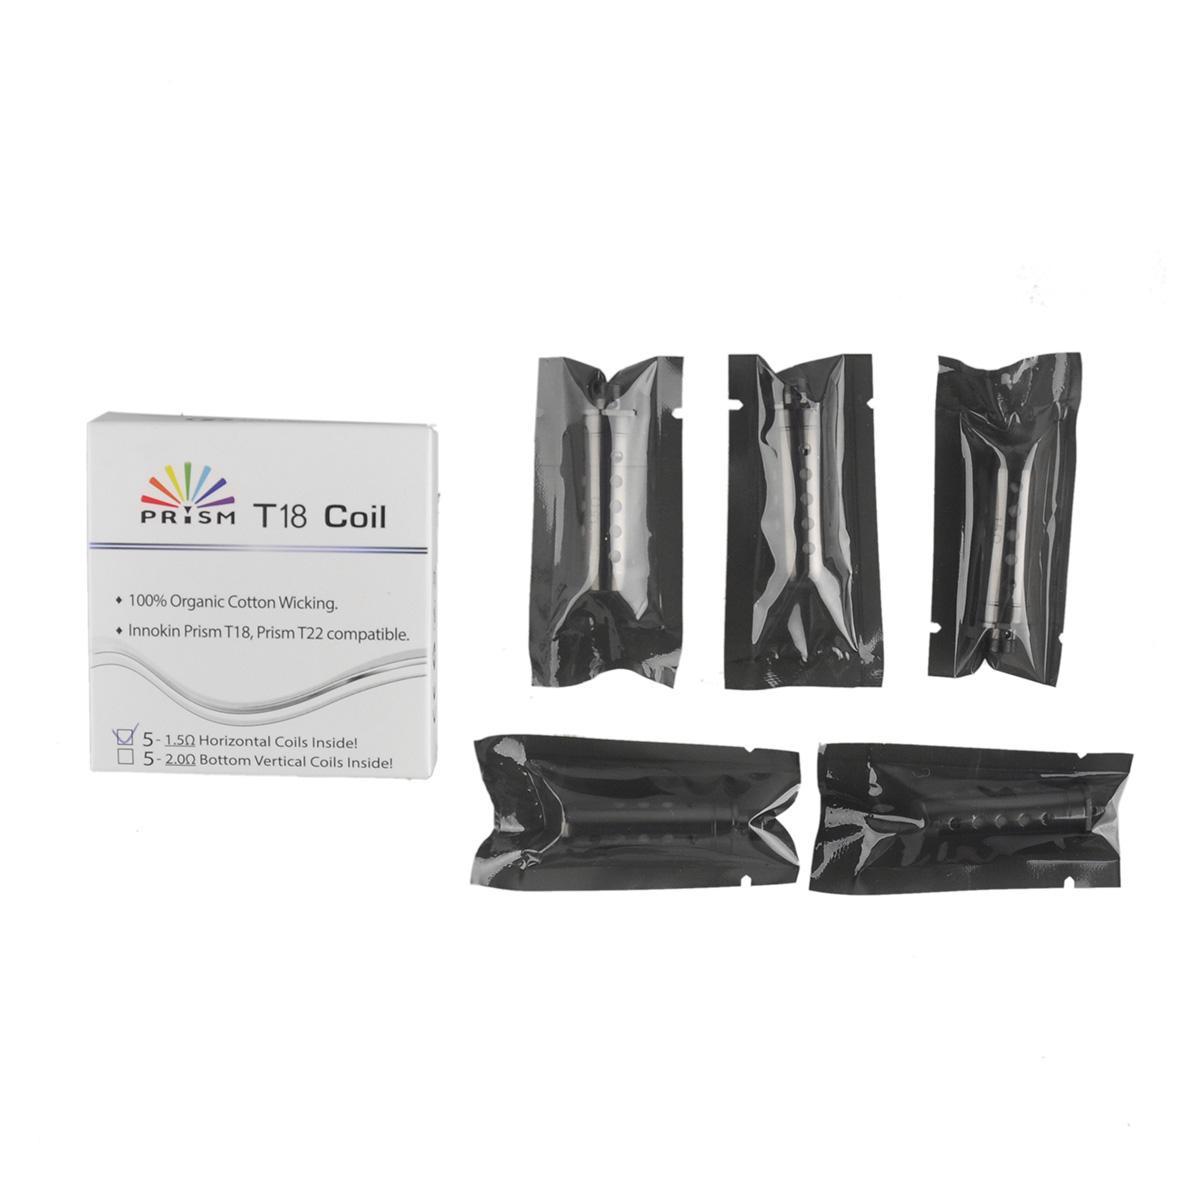 Innokin Prism T18 Coil Heads e cigarette 1.5ohm Replacement Coils For Endura Prism T18 Starter Kit Tanks 100% Original